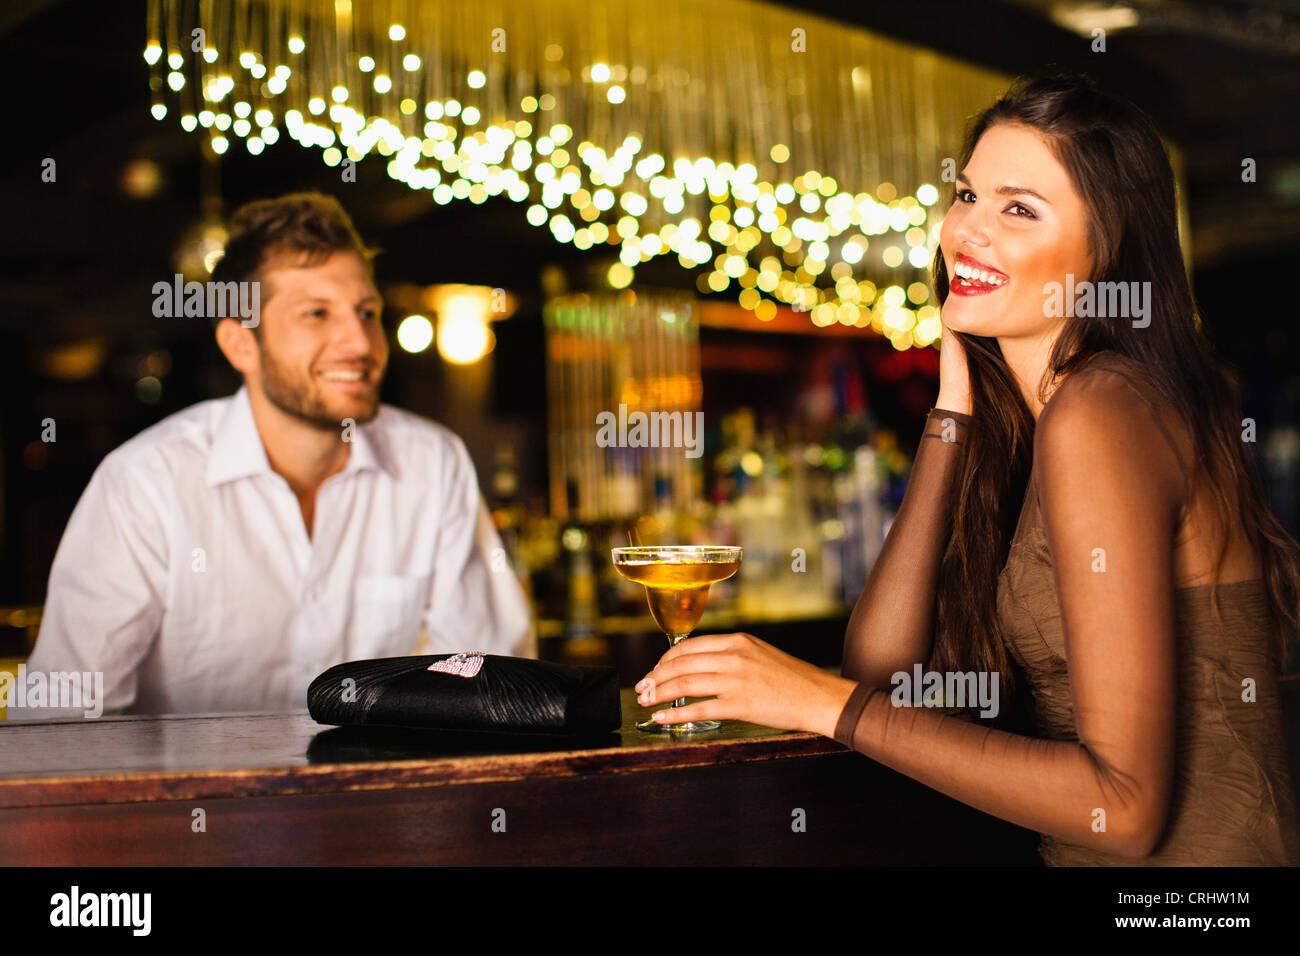 Frau im Gespräch mit Bartender bei Bar Stockbild